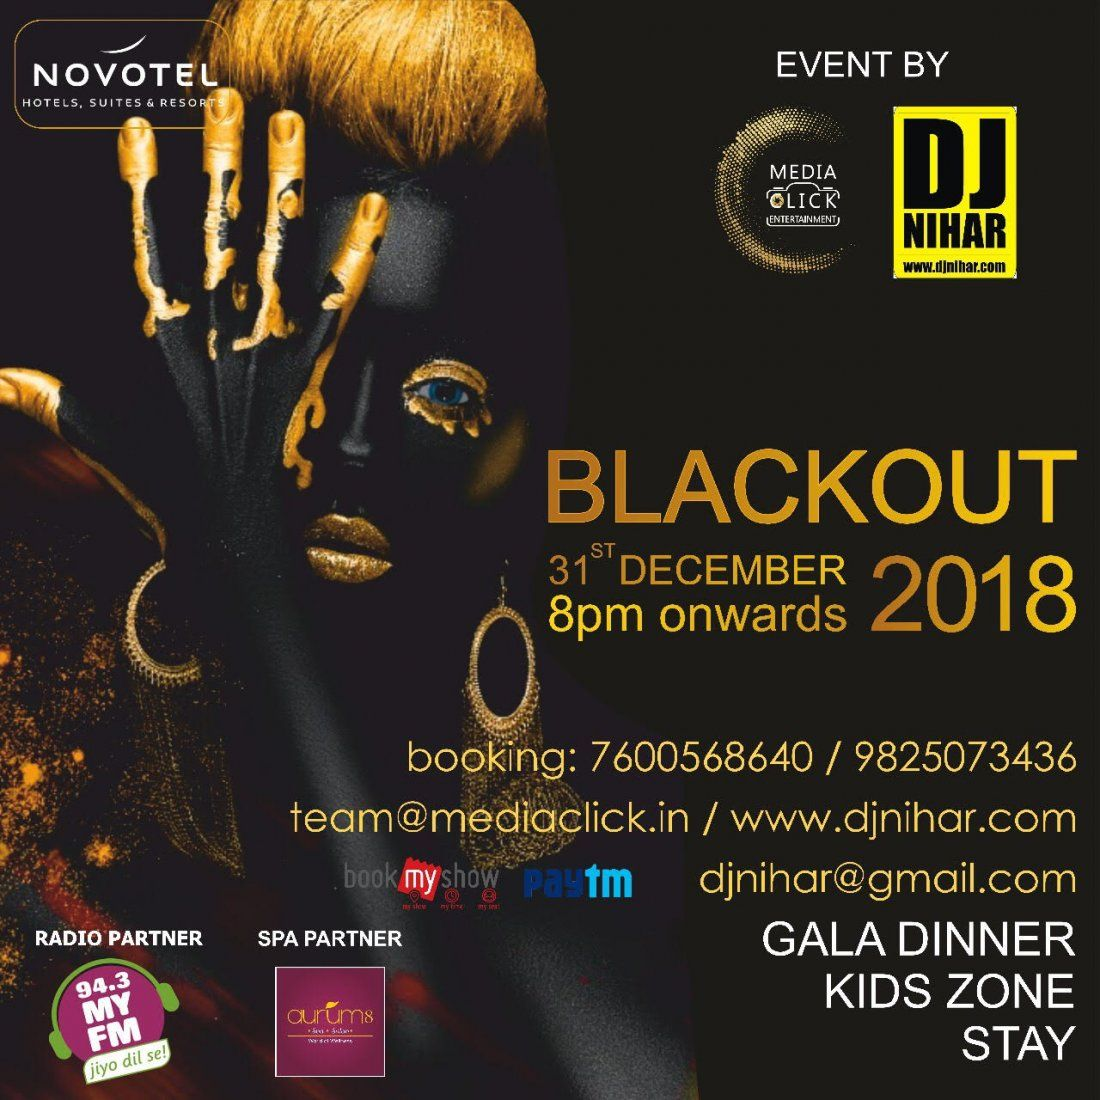 BLACKOUT 2018 BY DJNIHAR